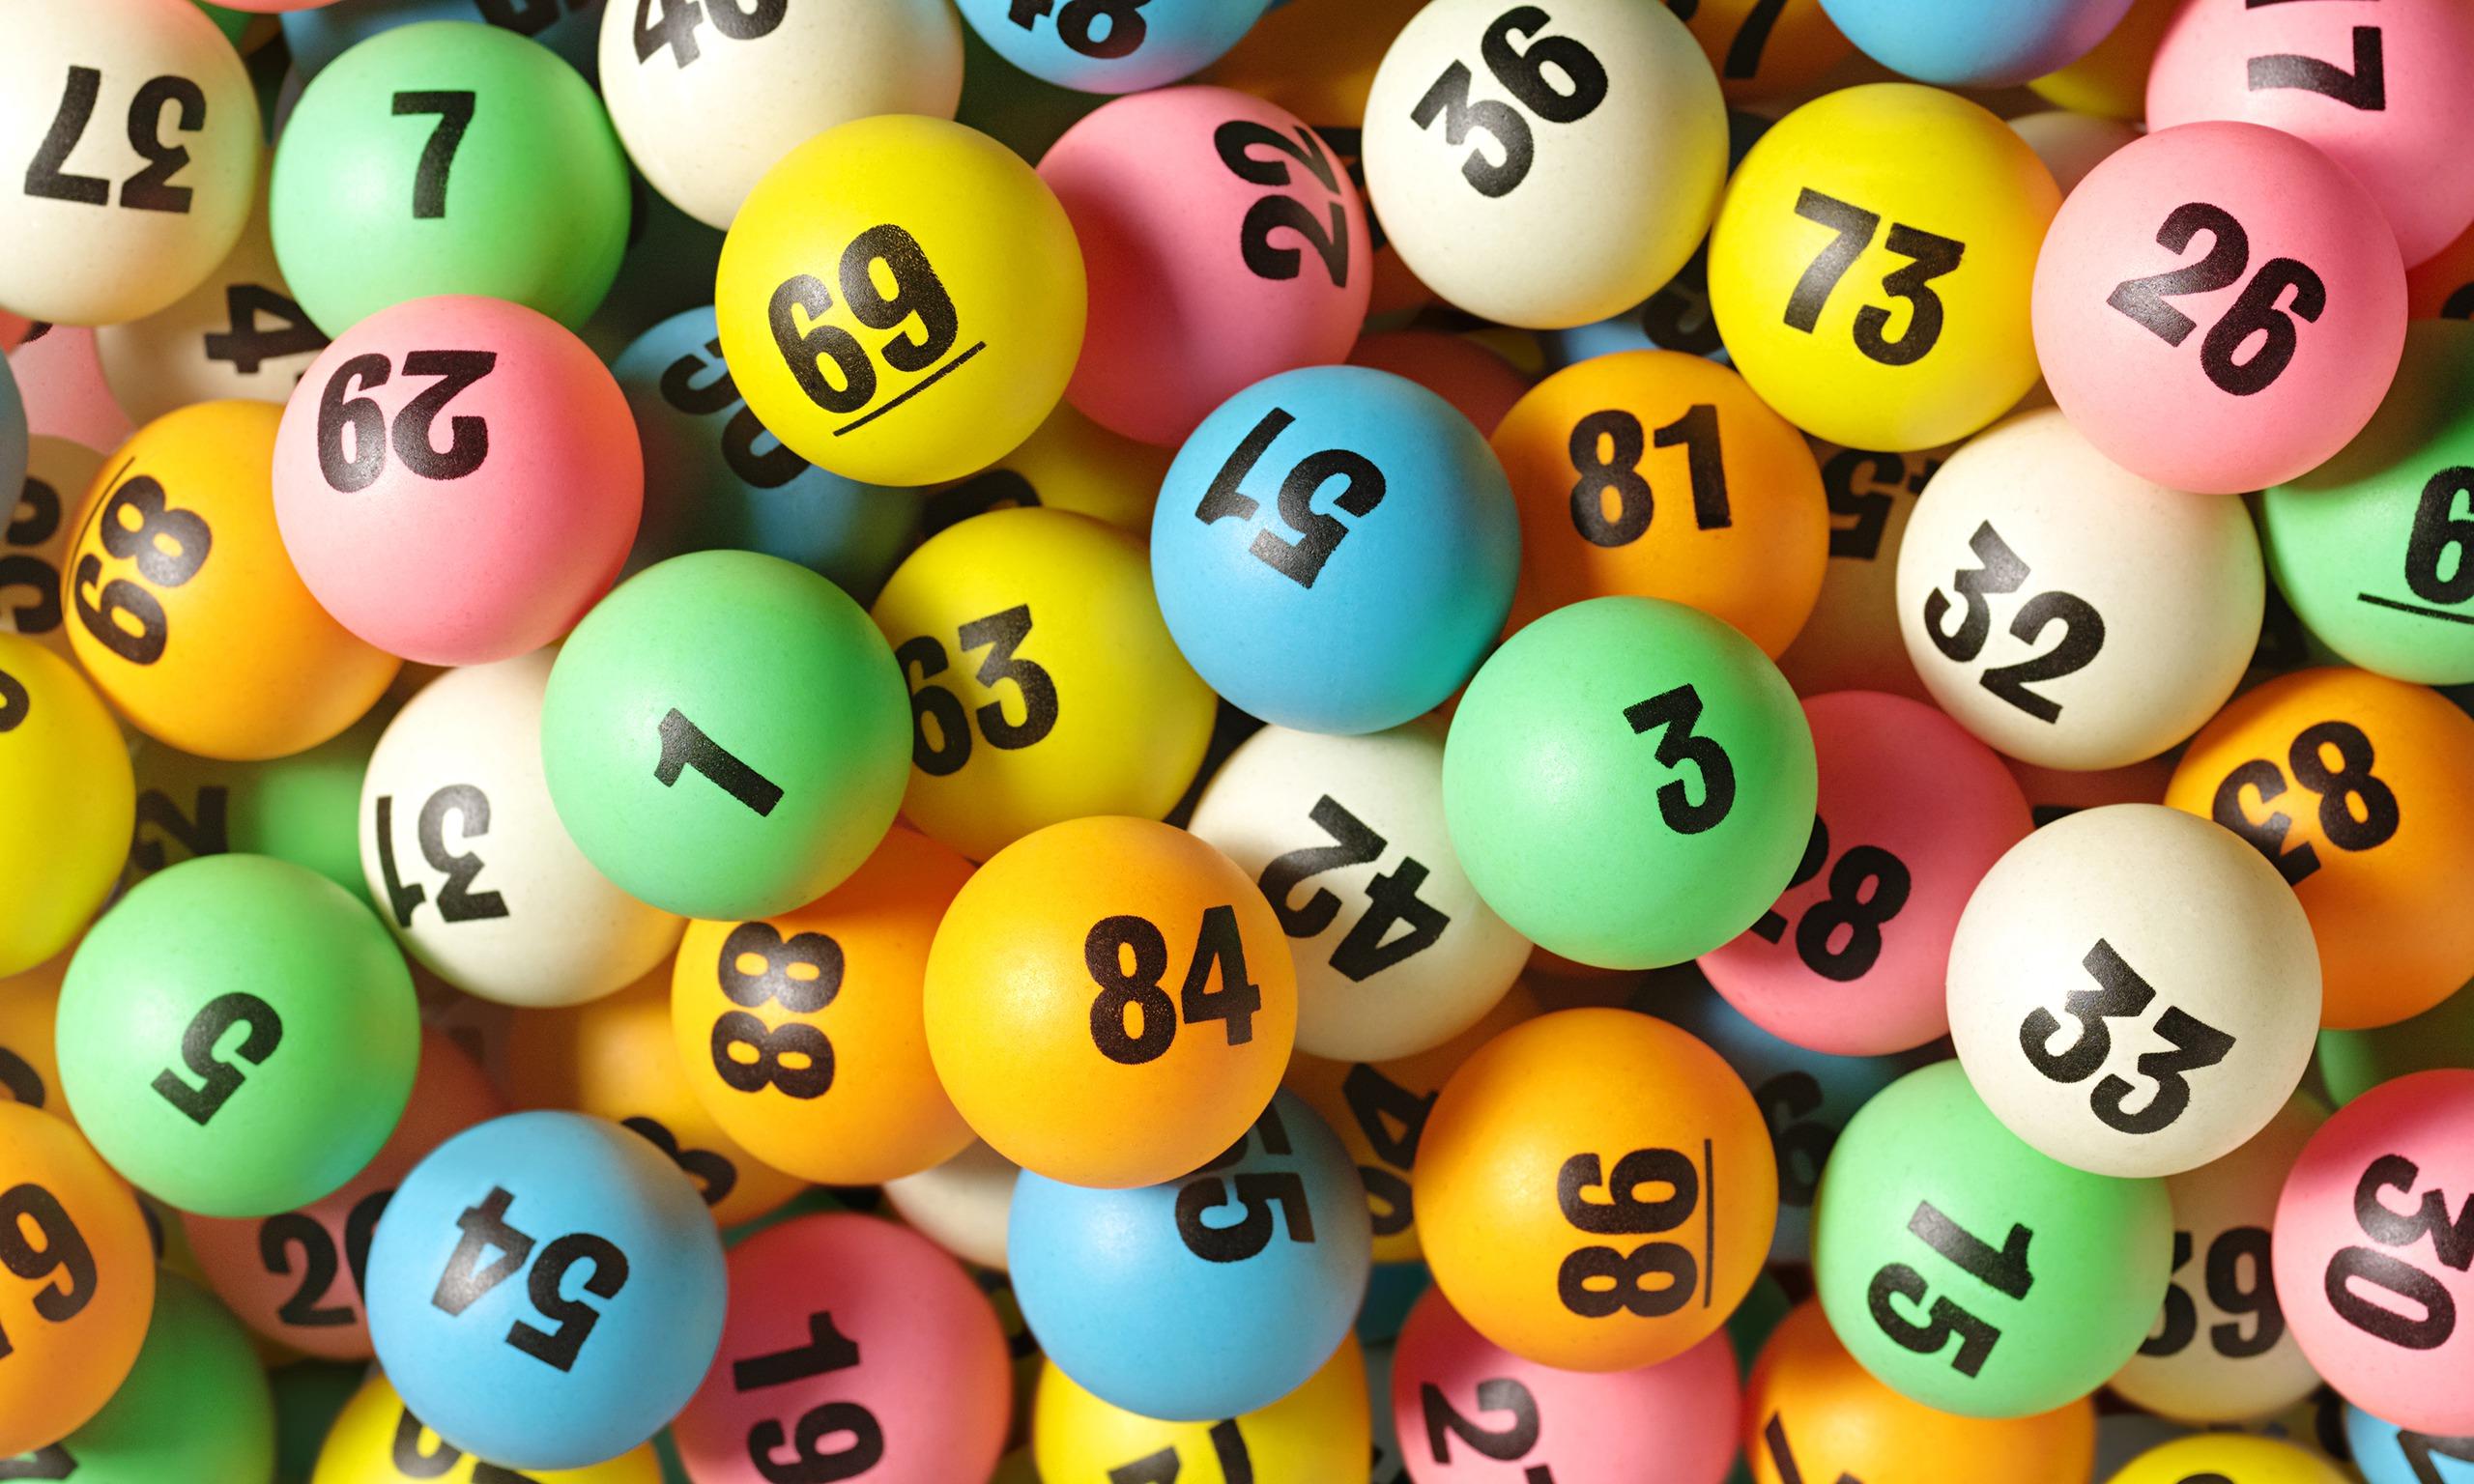 The Lotto Results are in to reveal a California Lottery Winner \u00bb CompareLotto